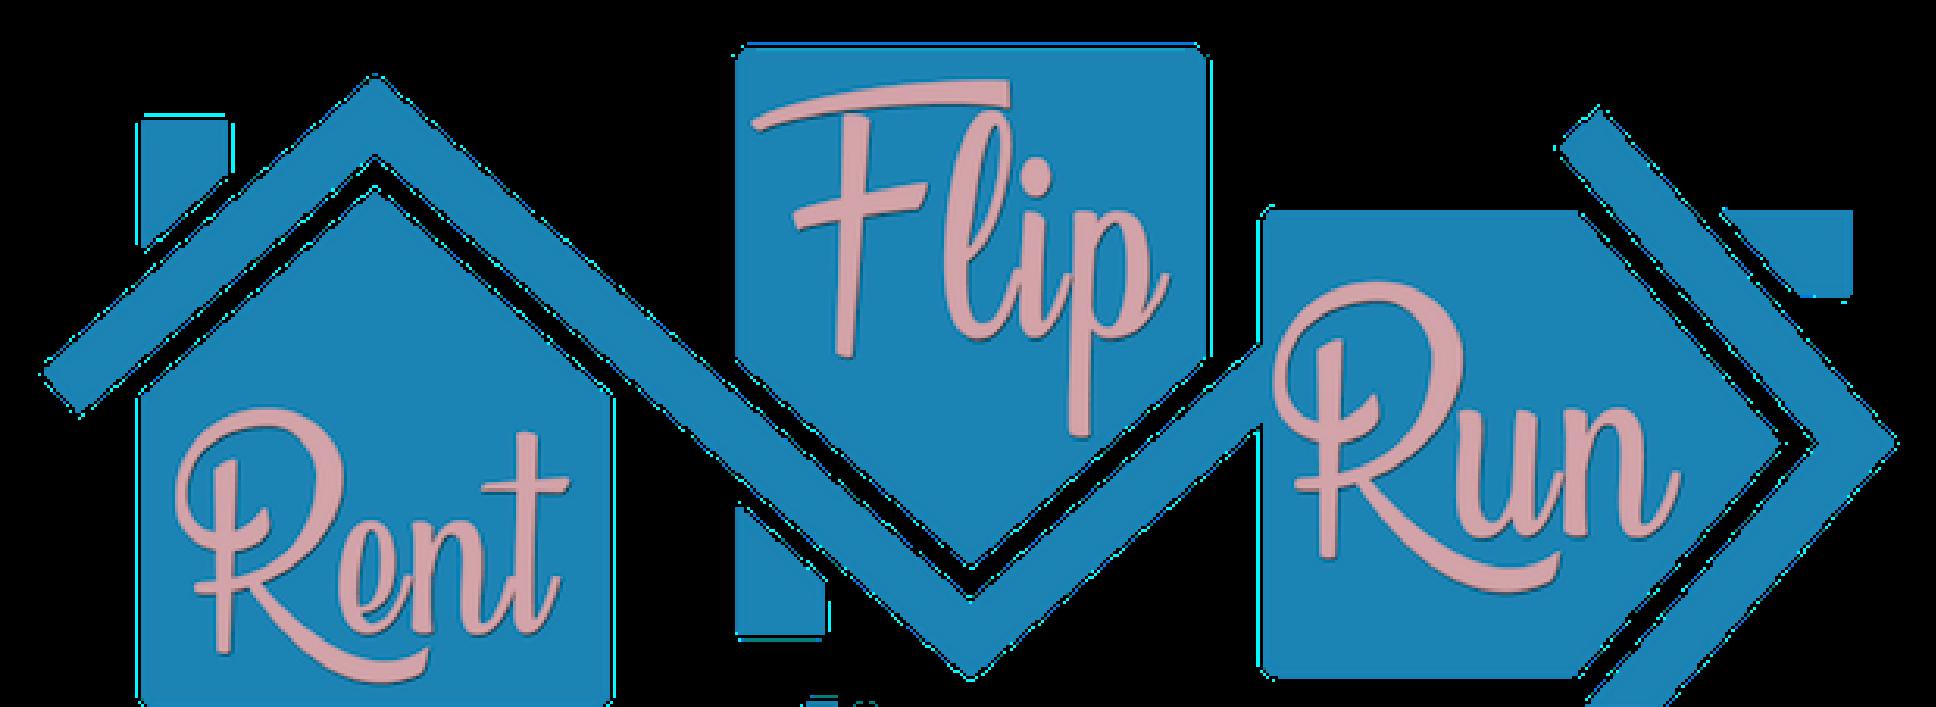 Should You Rent, Flip Or Run?